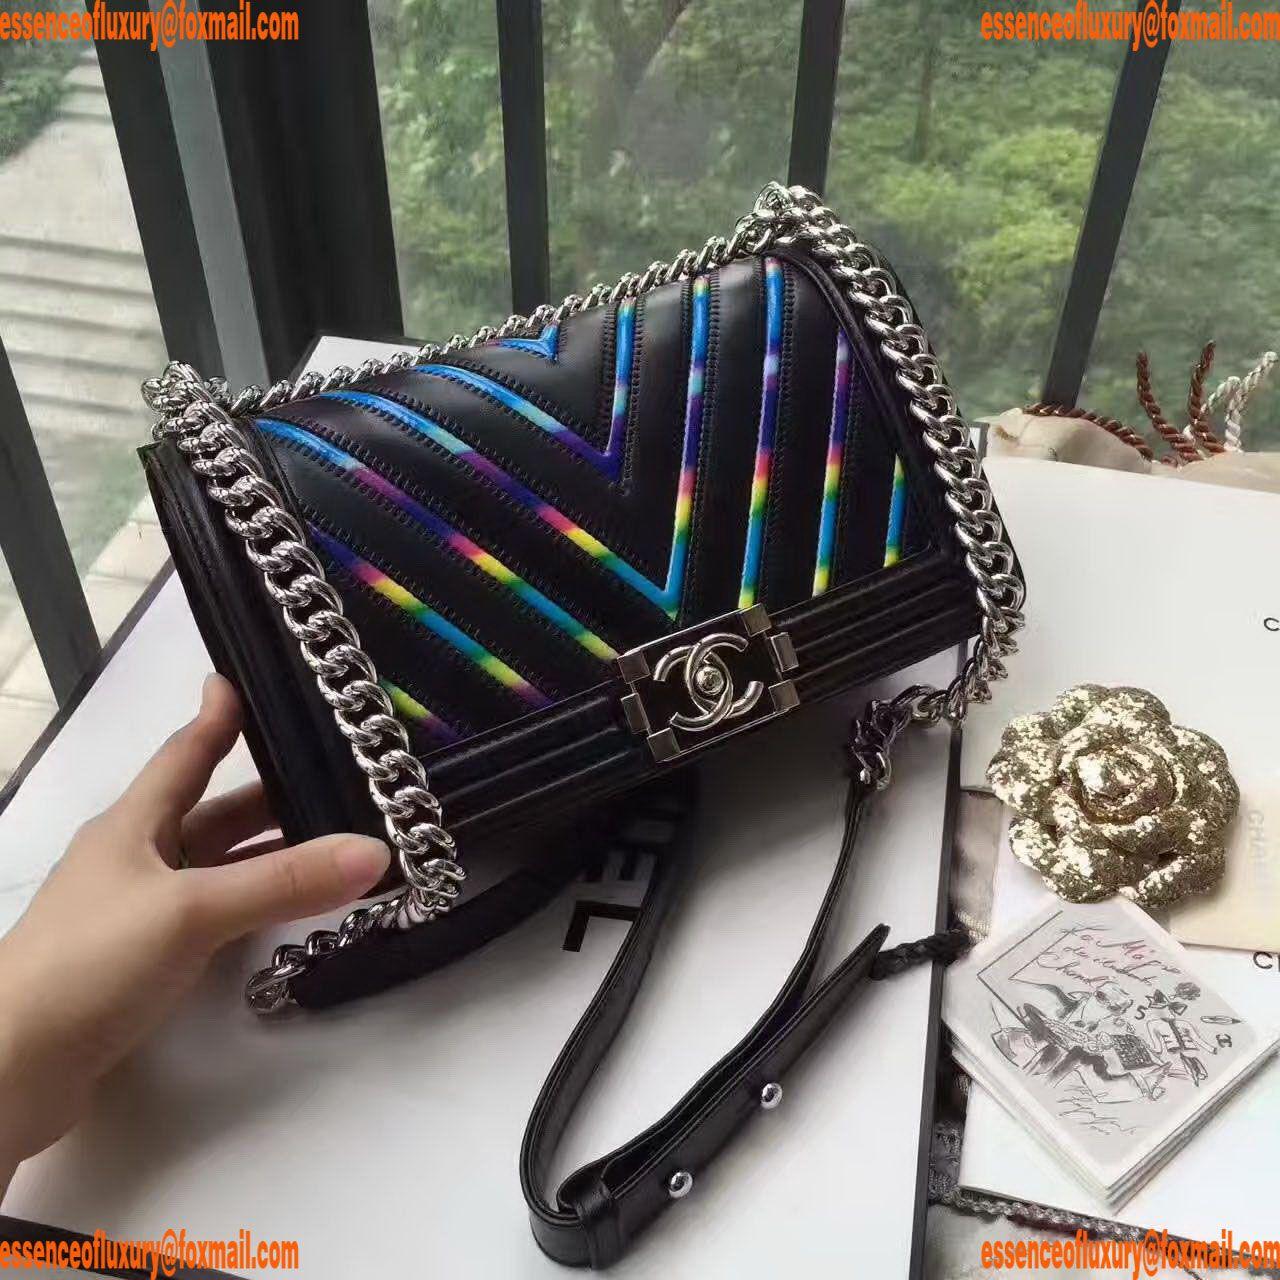 Replica Womens Handbags Chanel Iridescent Pvc Leather Boy